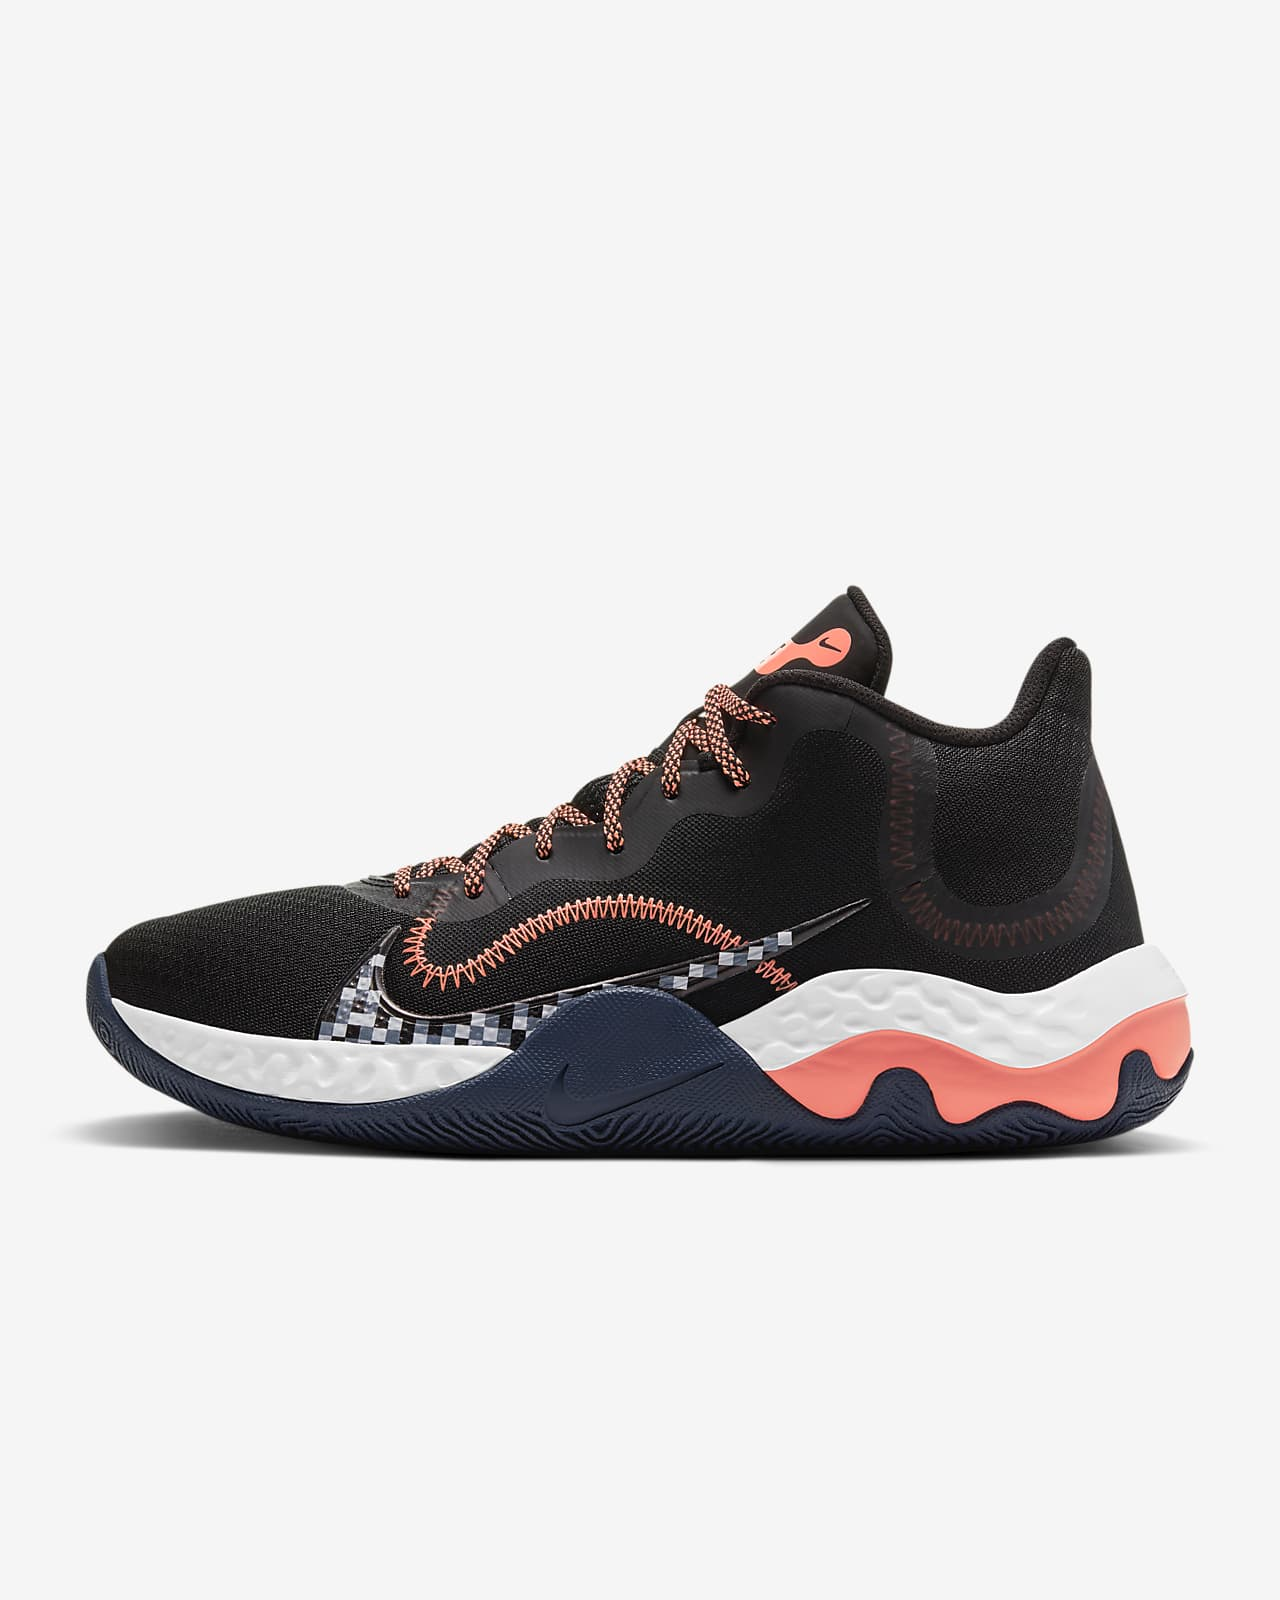 Calzado de básquetbol Nike Renew Elevate